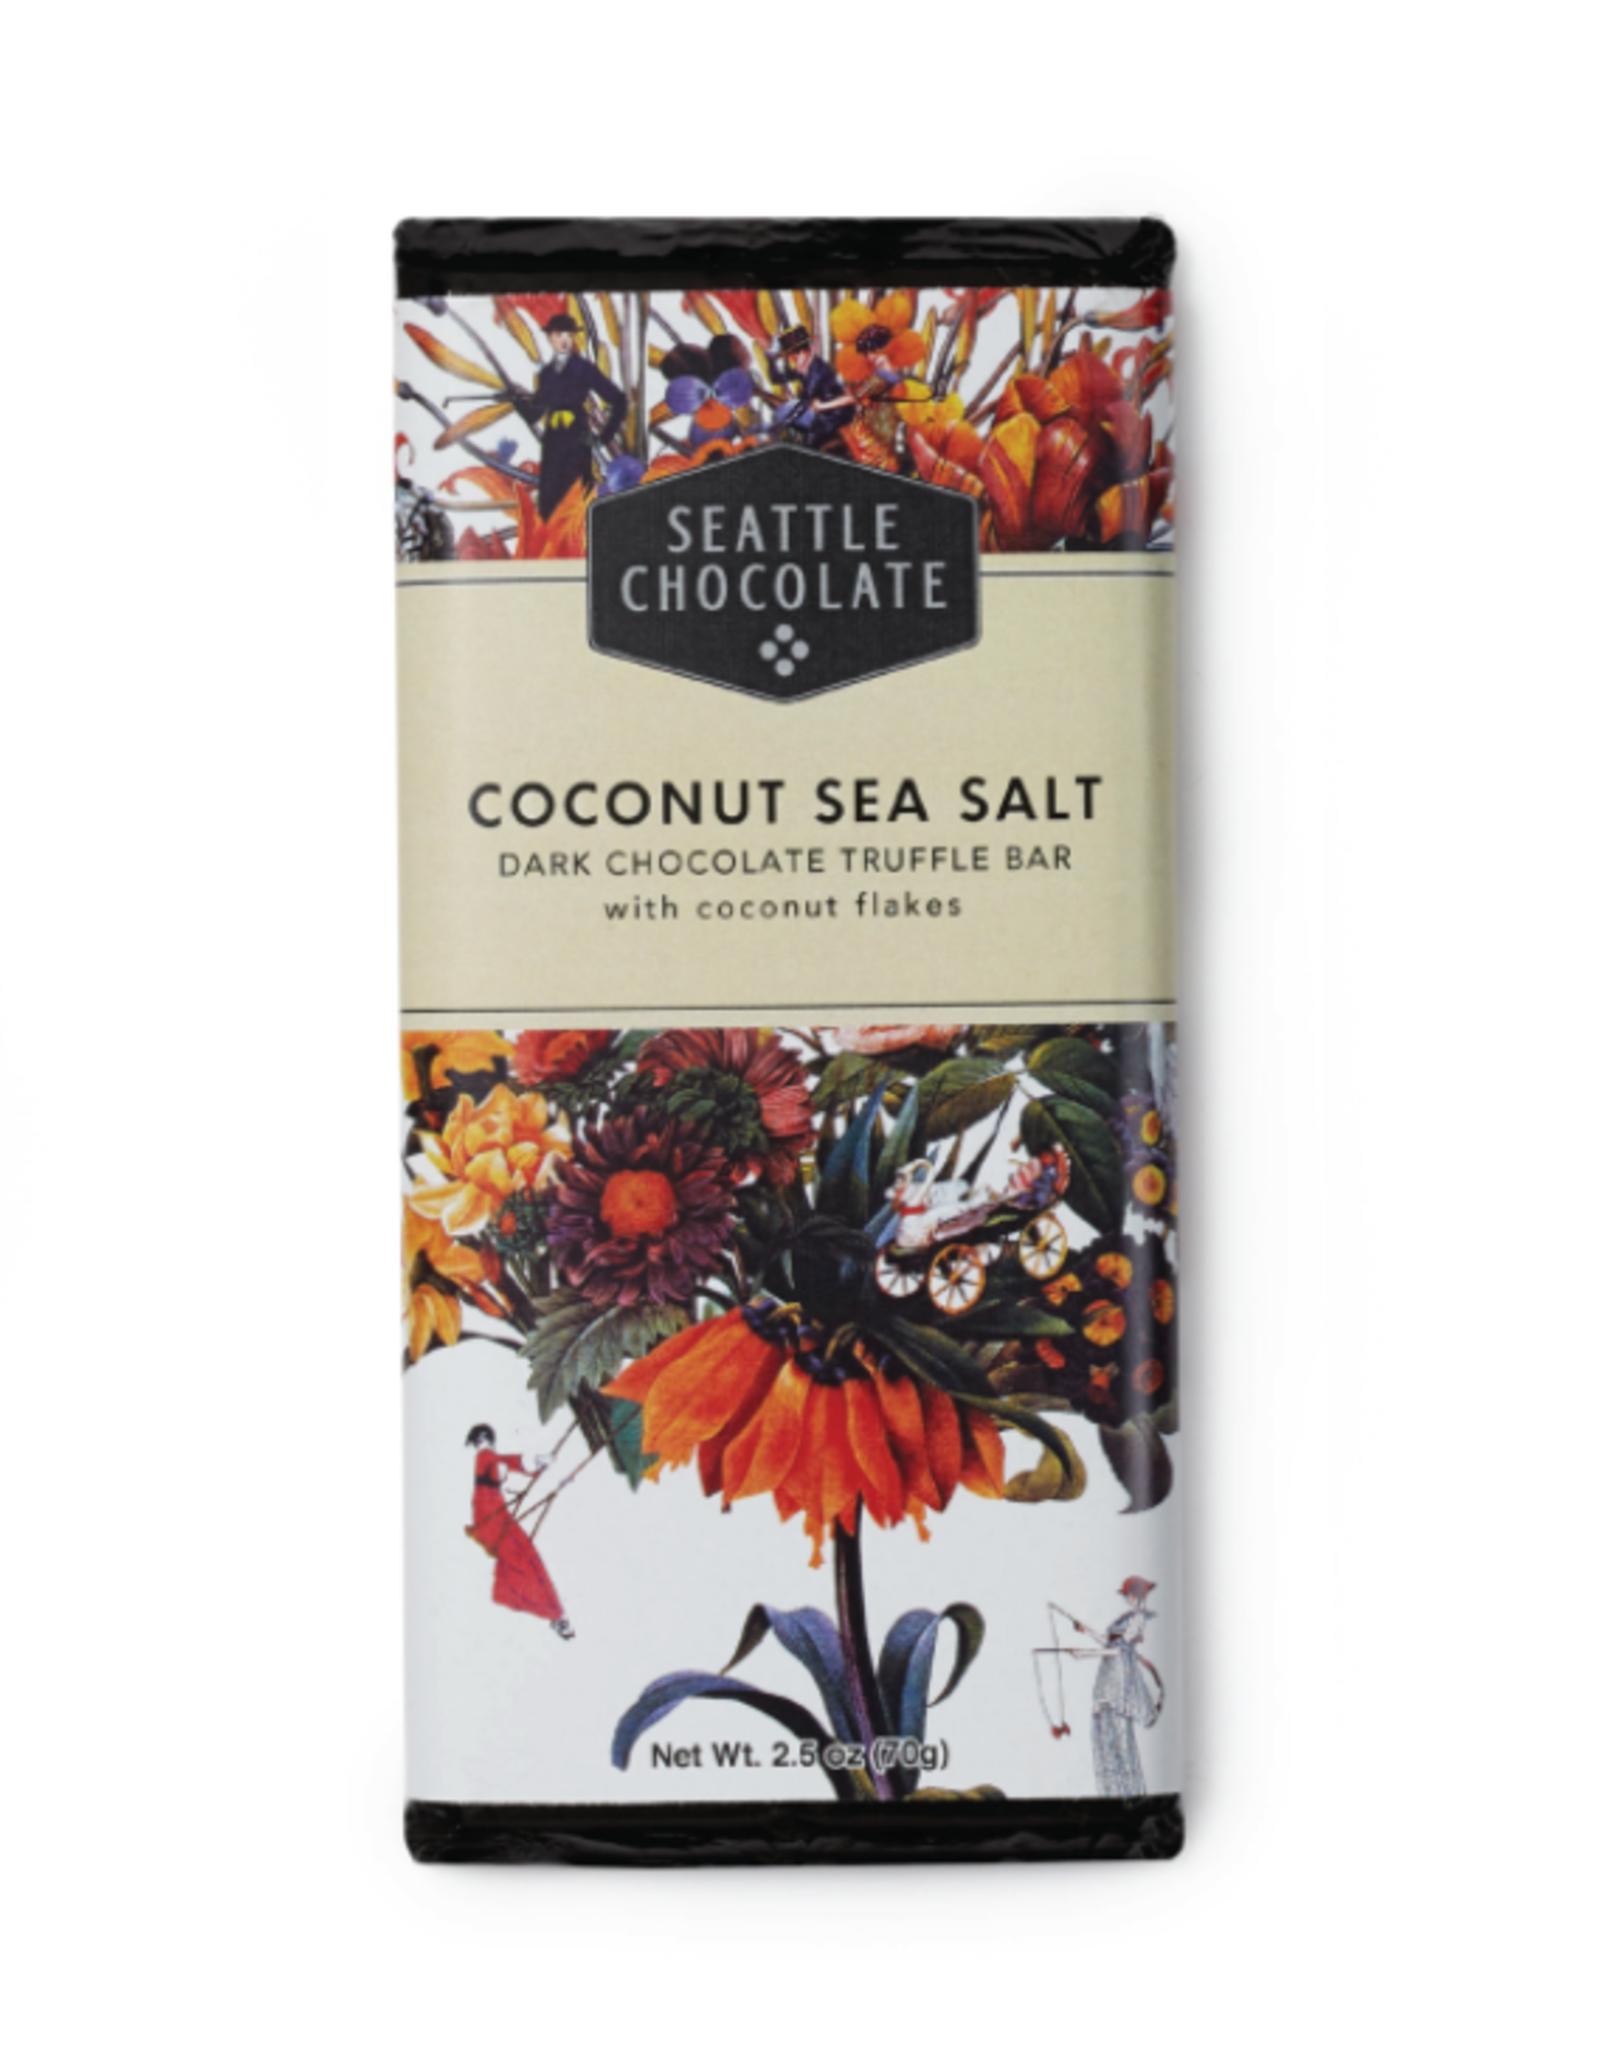 Seattle Chocolate Coconut Sea Salt Truffle Bar